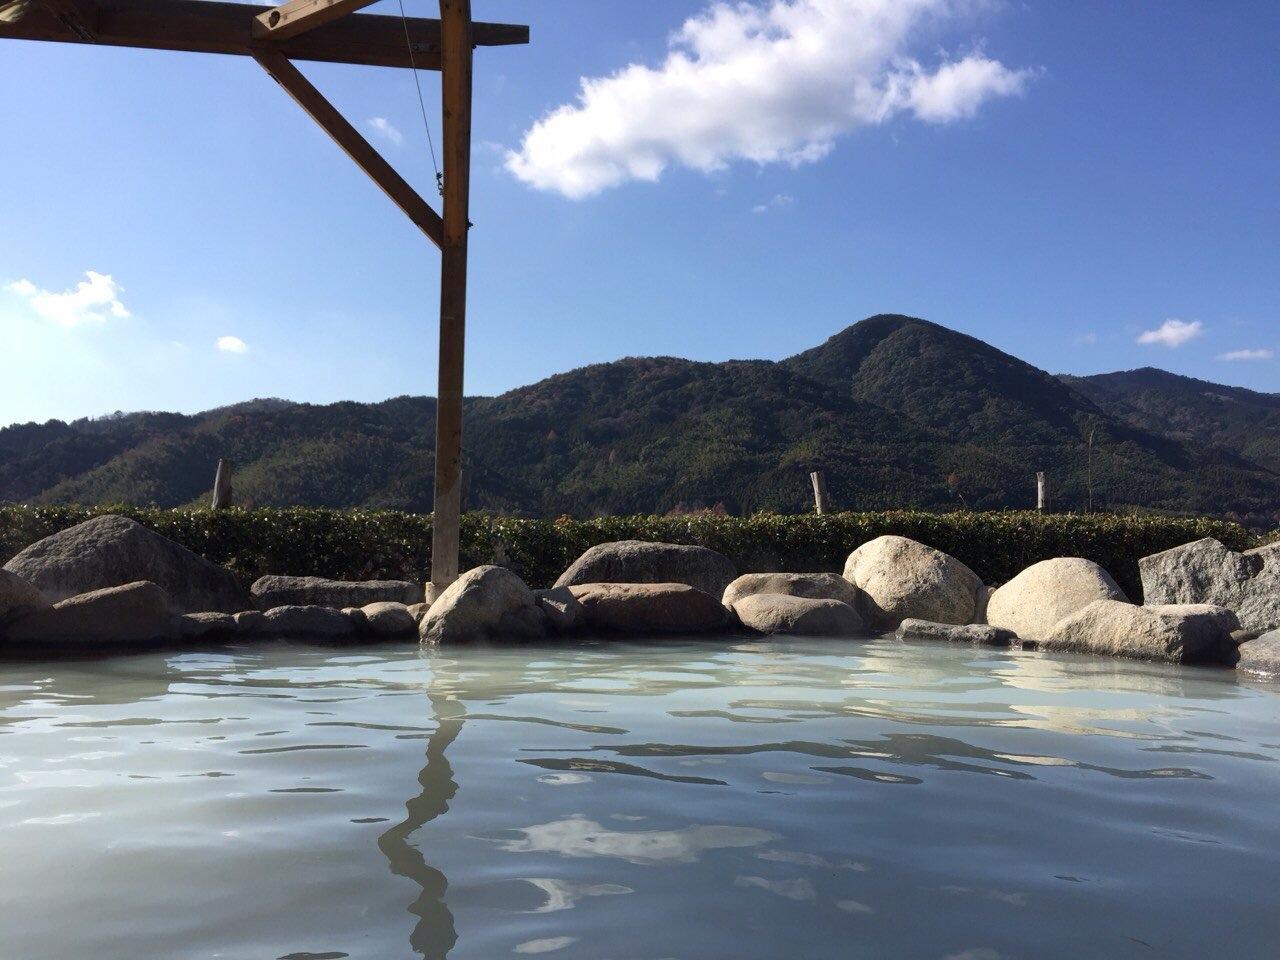 A day trip to a hot spring, Yoshinogari